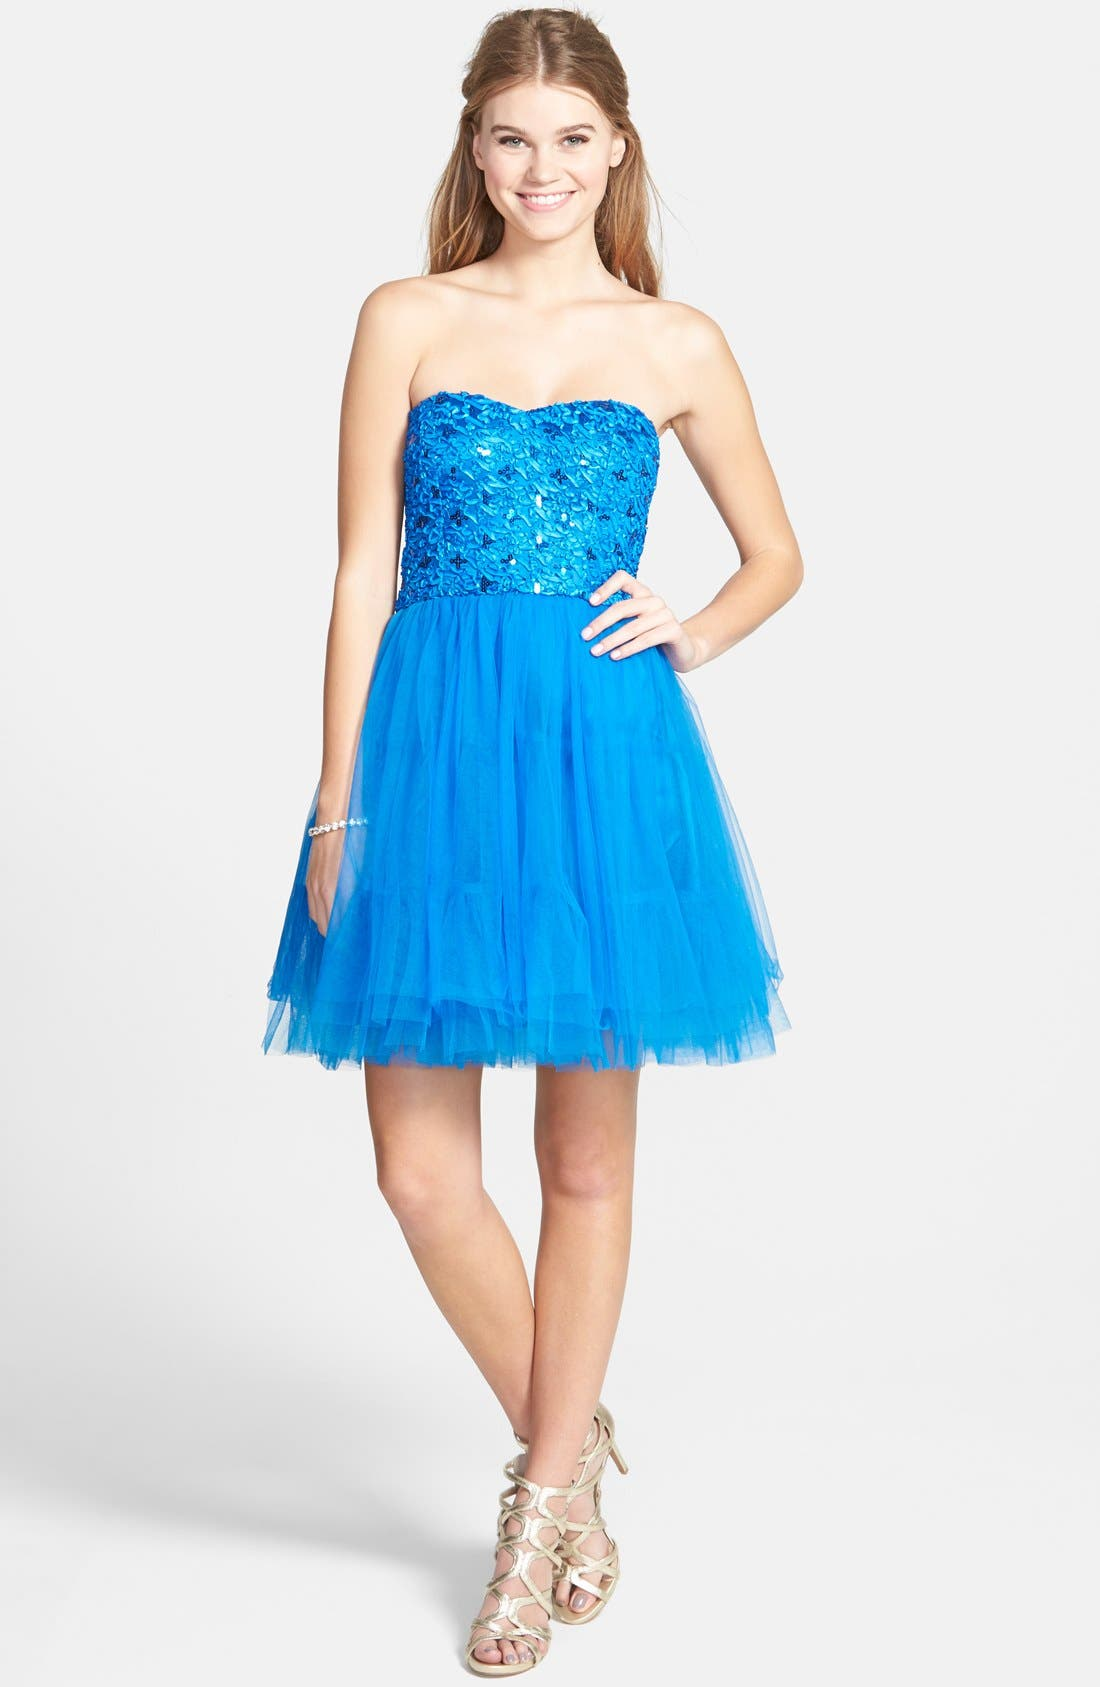 Alternate Image 1 Selected - a. drea Lace-Up Back Party Dress (Juniors)